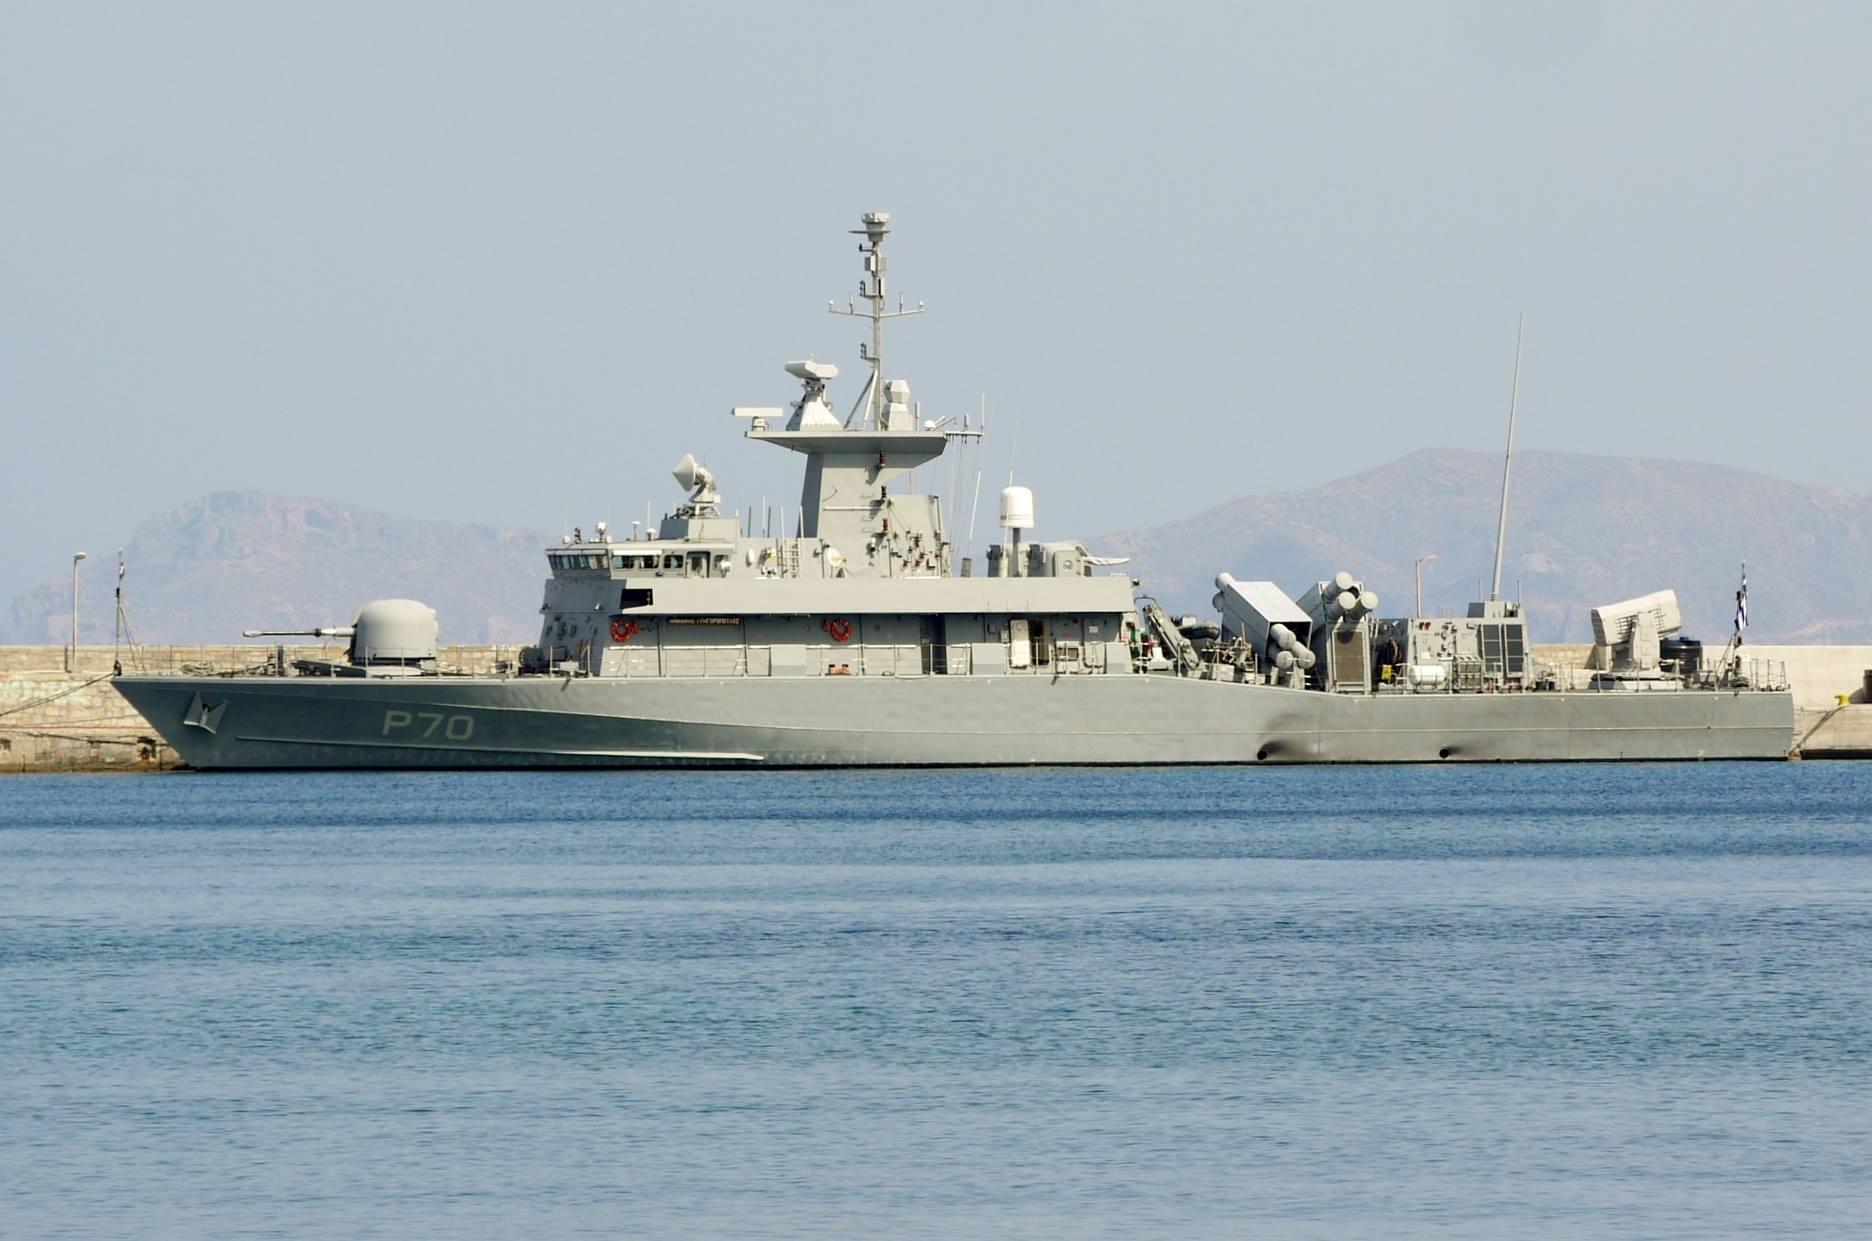 Hellenic Navy - Marine Grecque - Page 2 27800726570_a15d6c8ac0_o